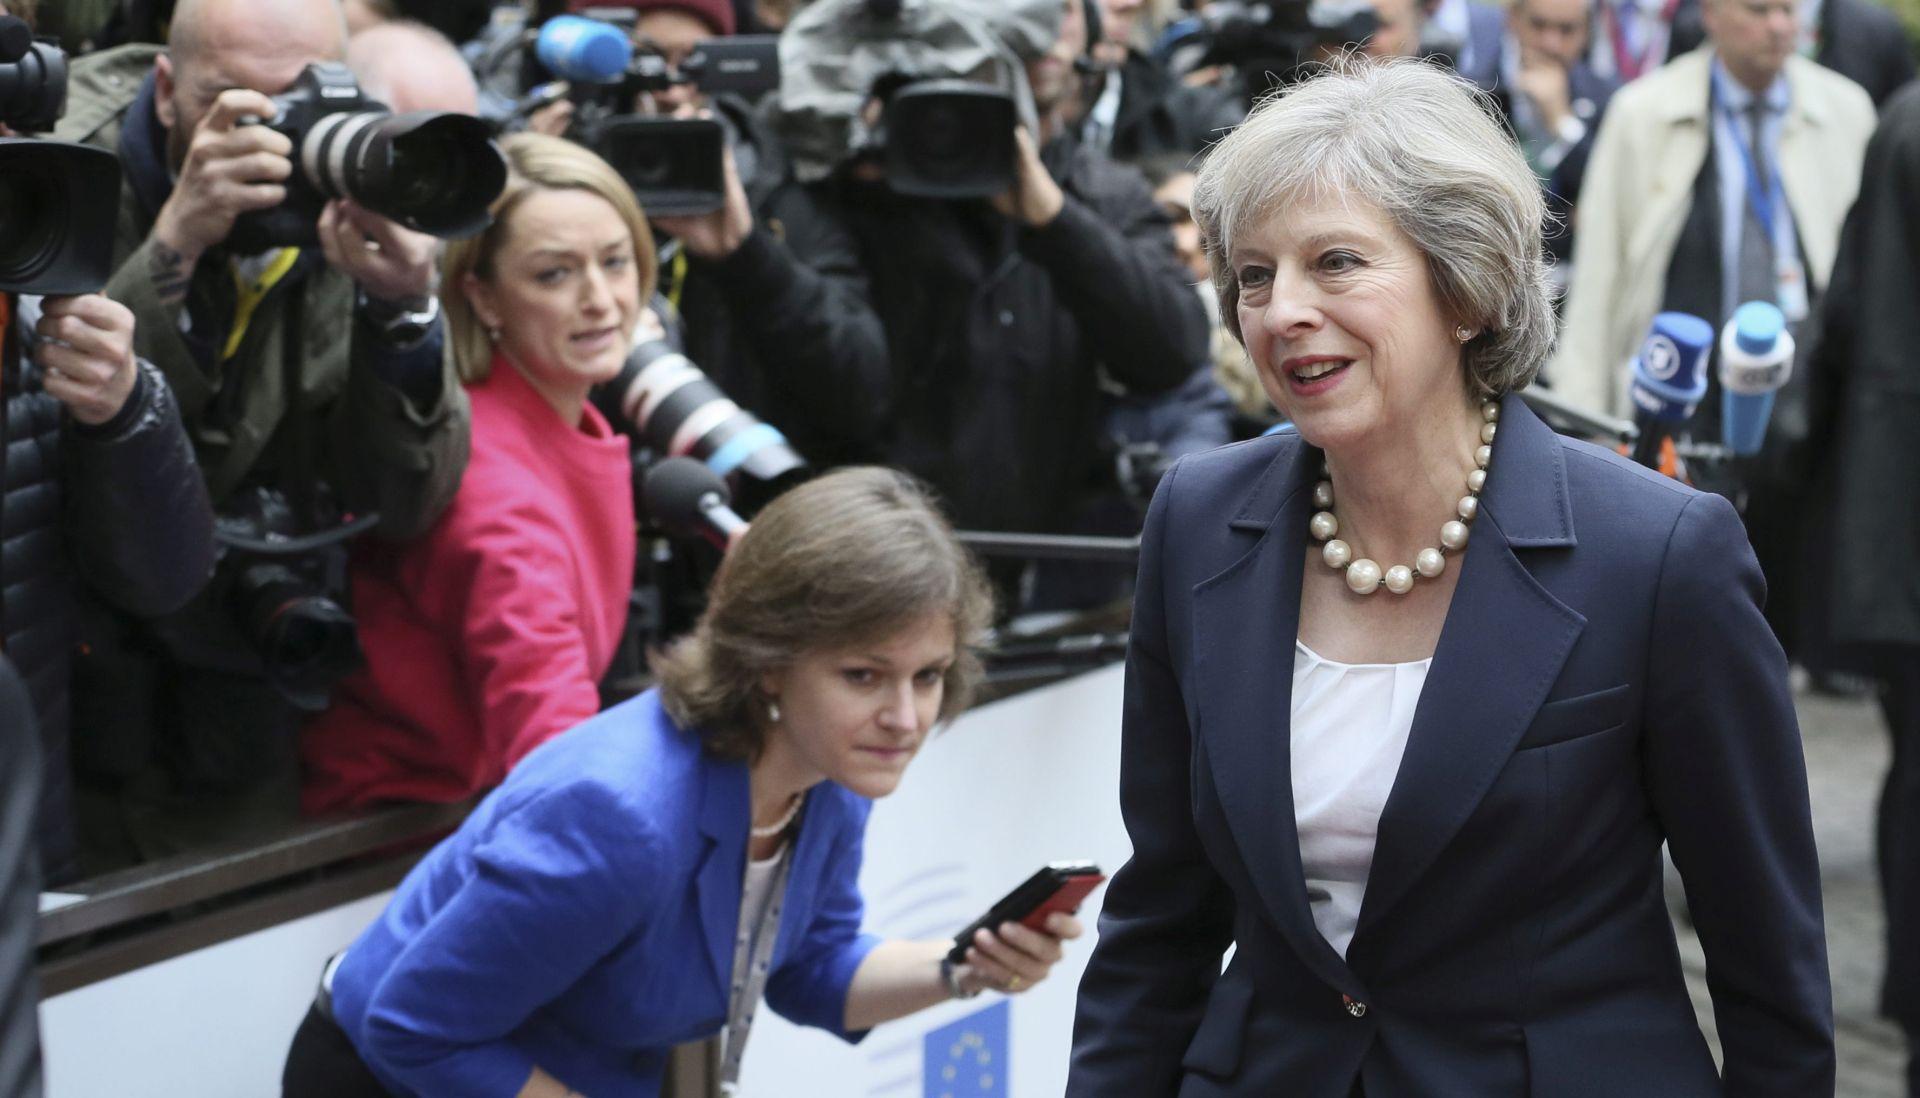 May: Parlament mora prihvatiti da je izglasavanje Brexita bilo legitimno